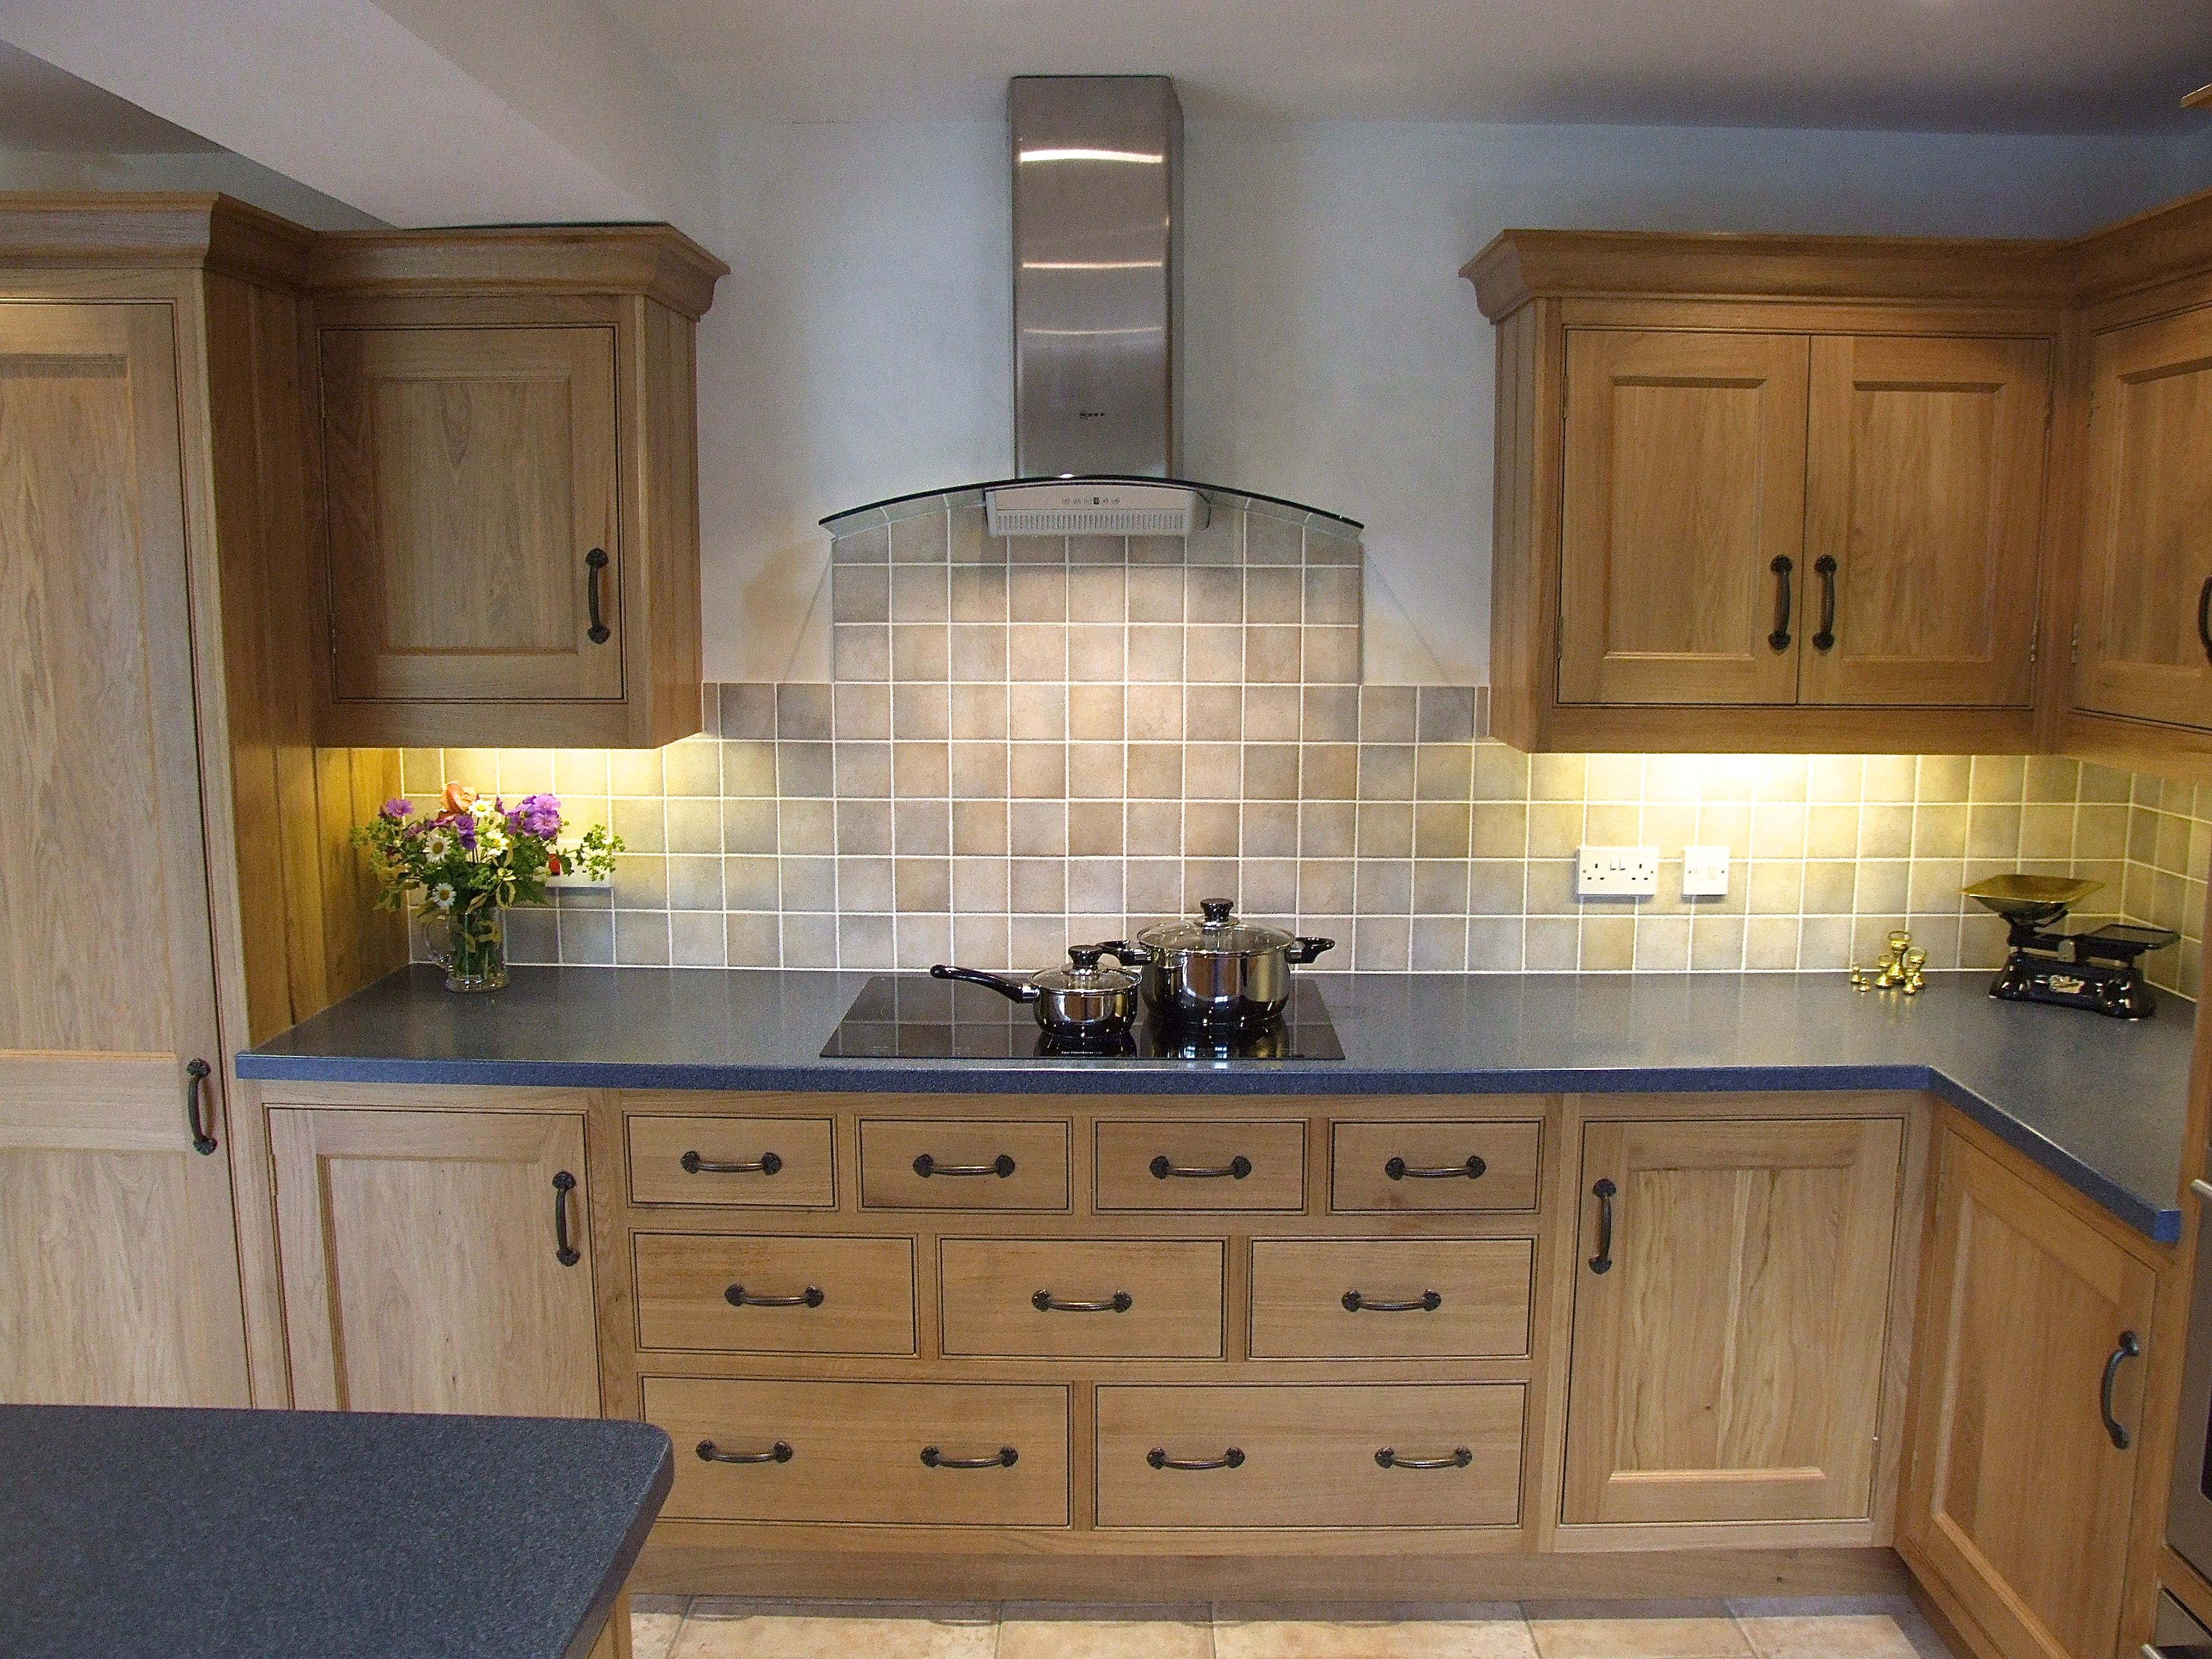 Traditional Oak Kitchen Happily Wears Black Wrought Iron Door Furniture,  With Blue Corian Worktops,